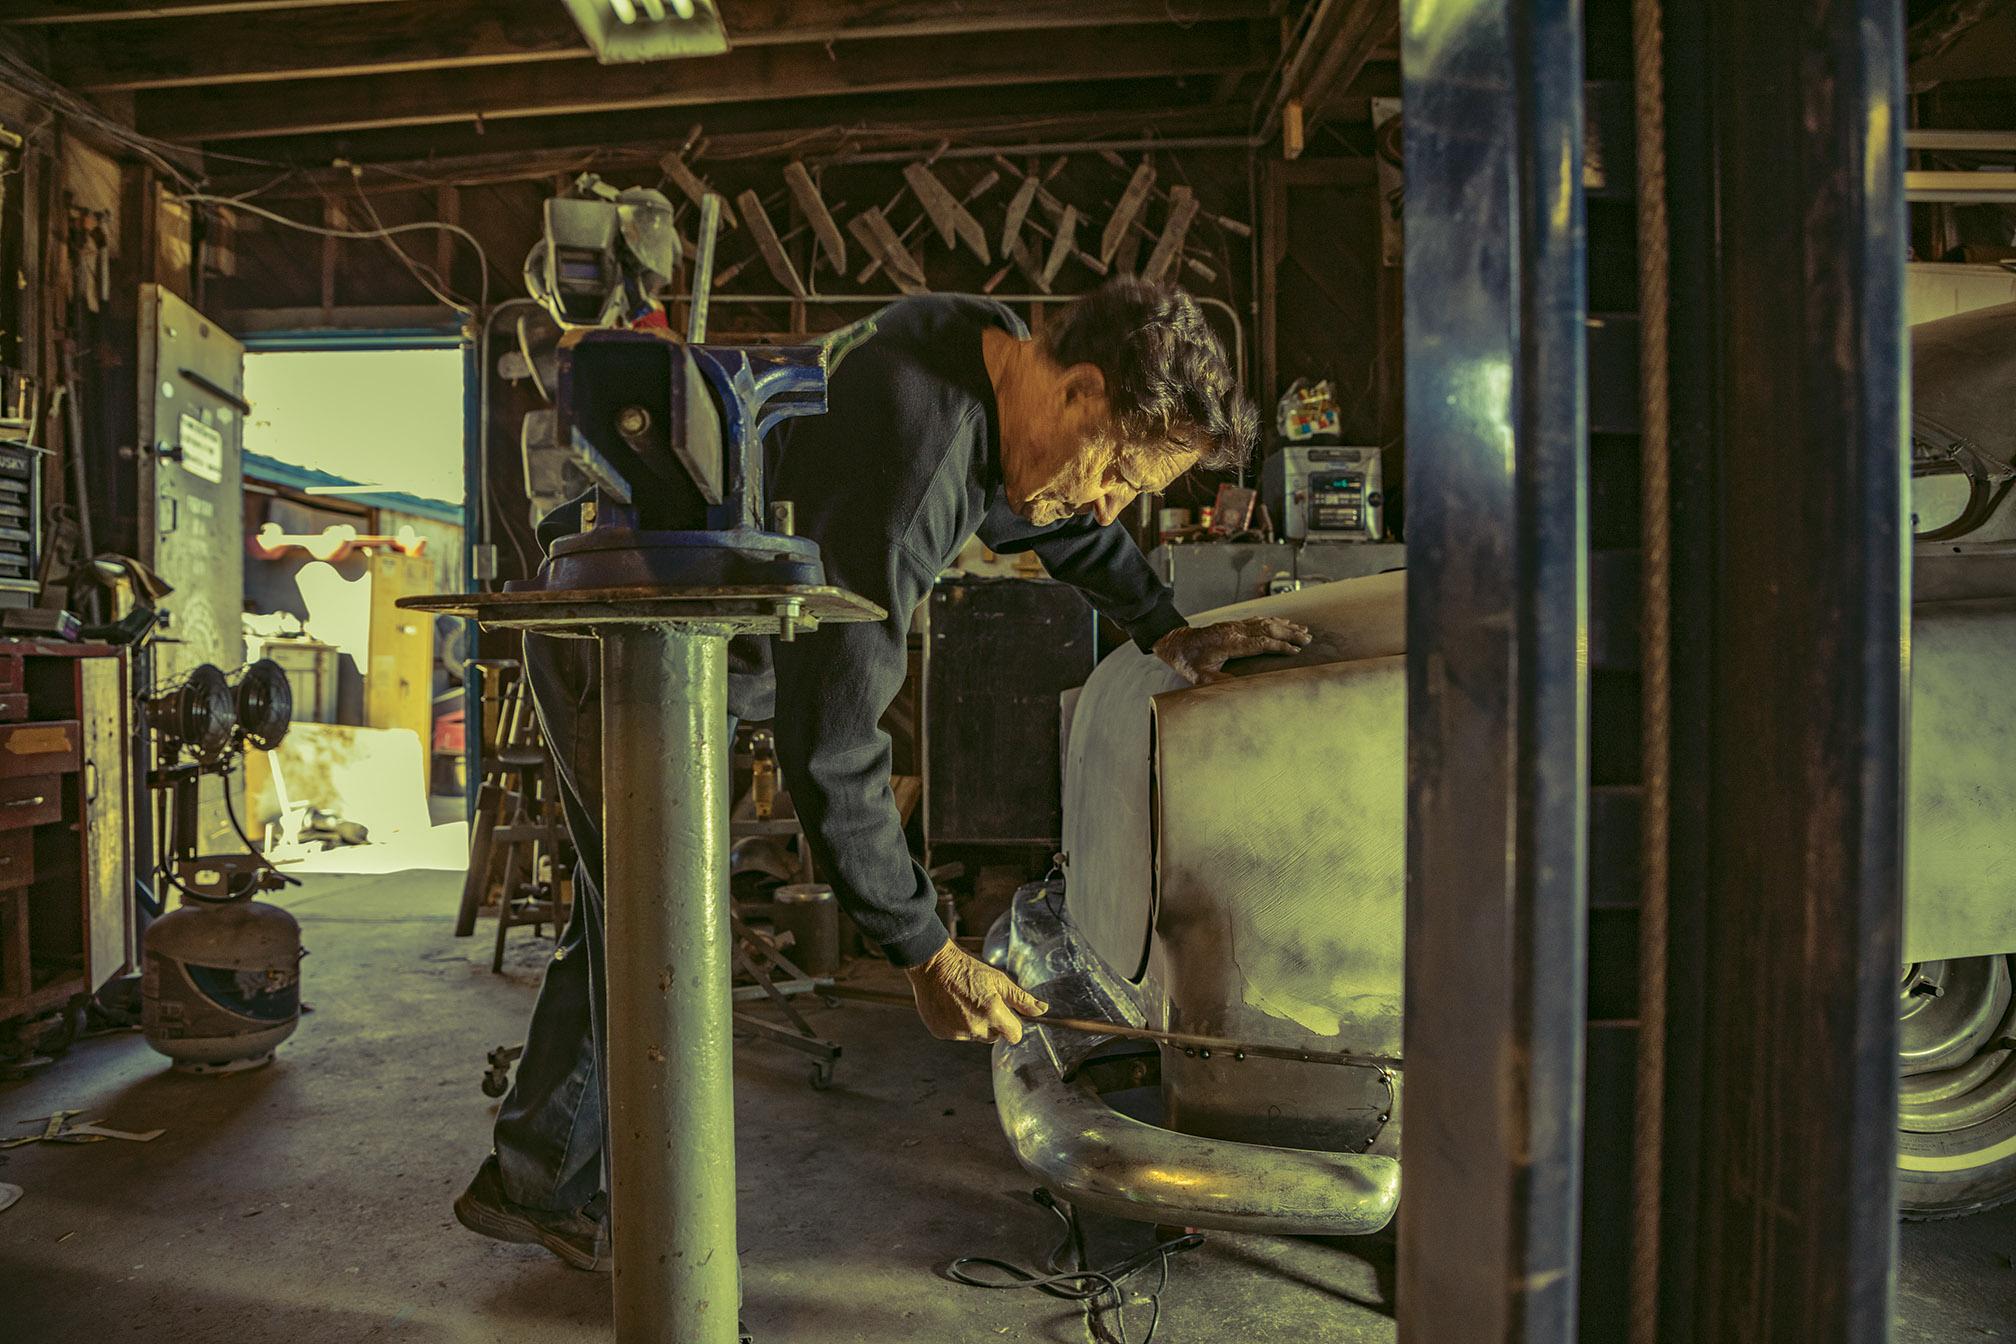 Metal working and welding